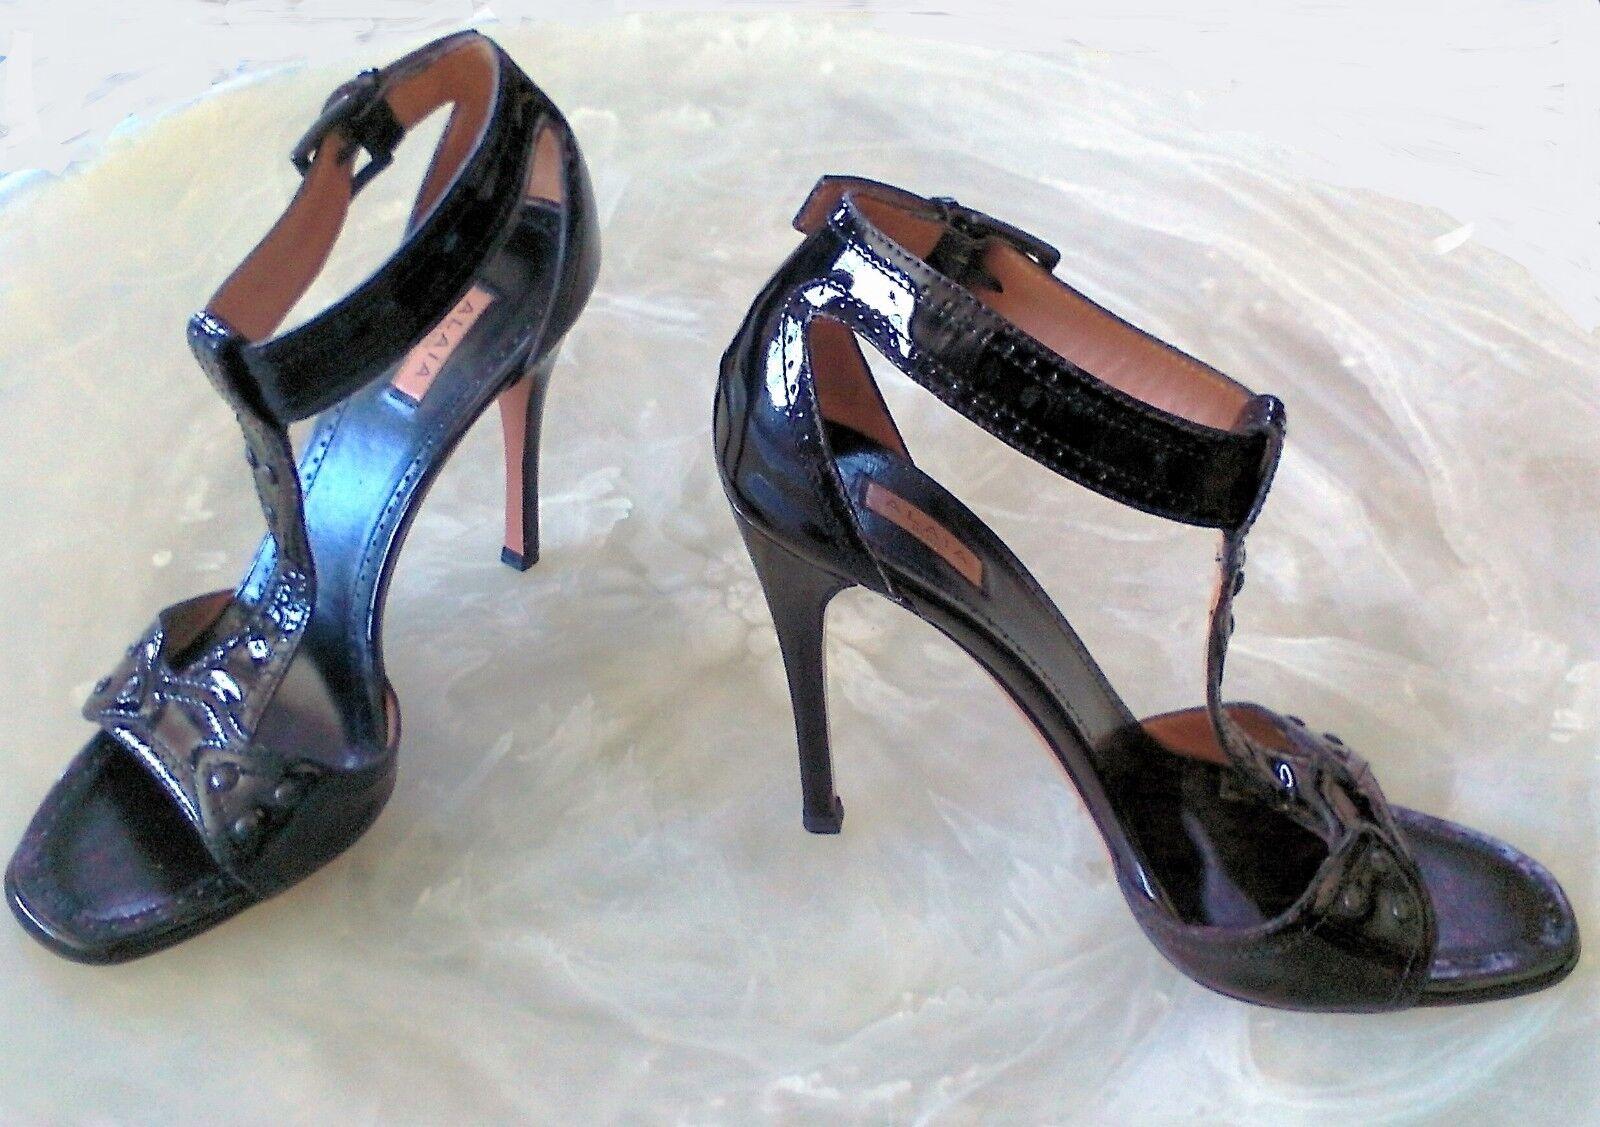 Alaia Damen 6.5 Blk Lackleder Open Toe Knöchel T-Riemen Stiletto Absatz